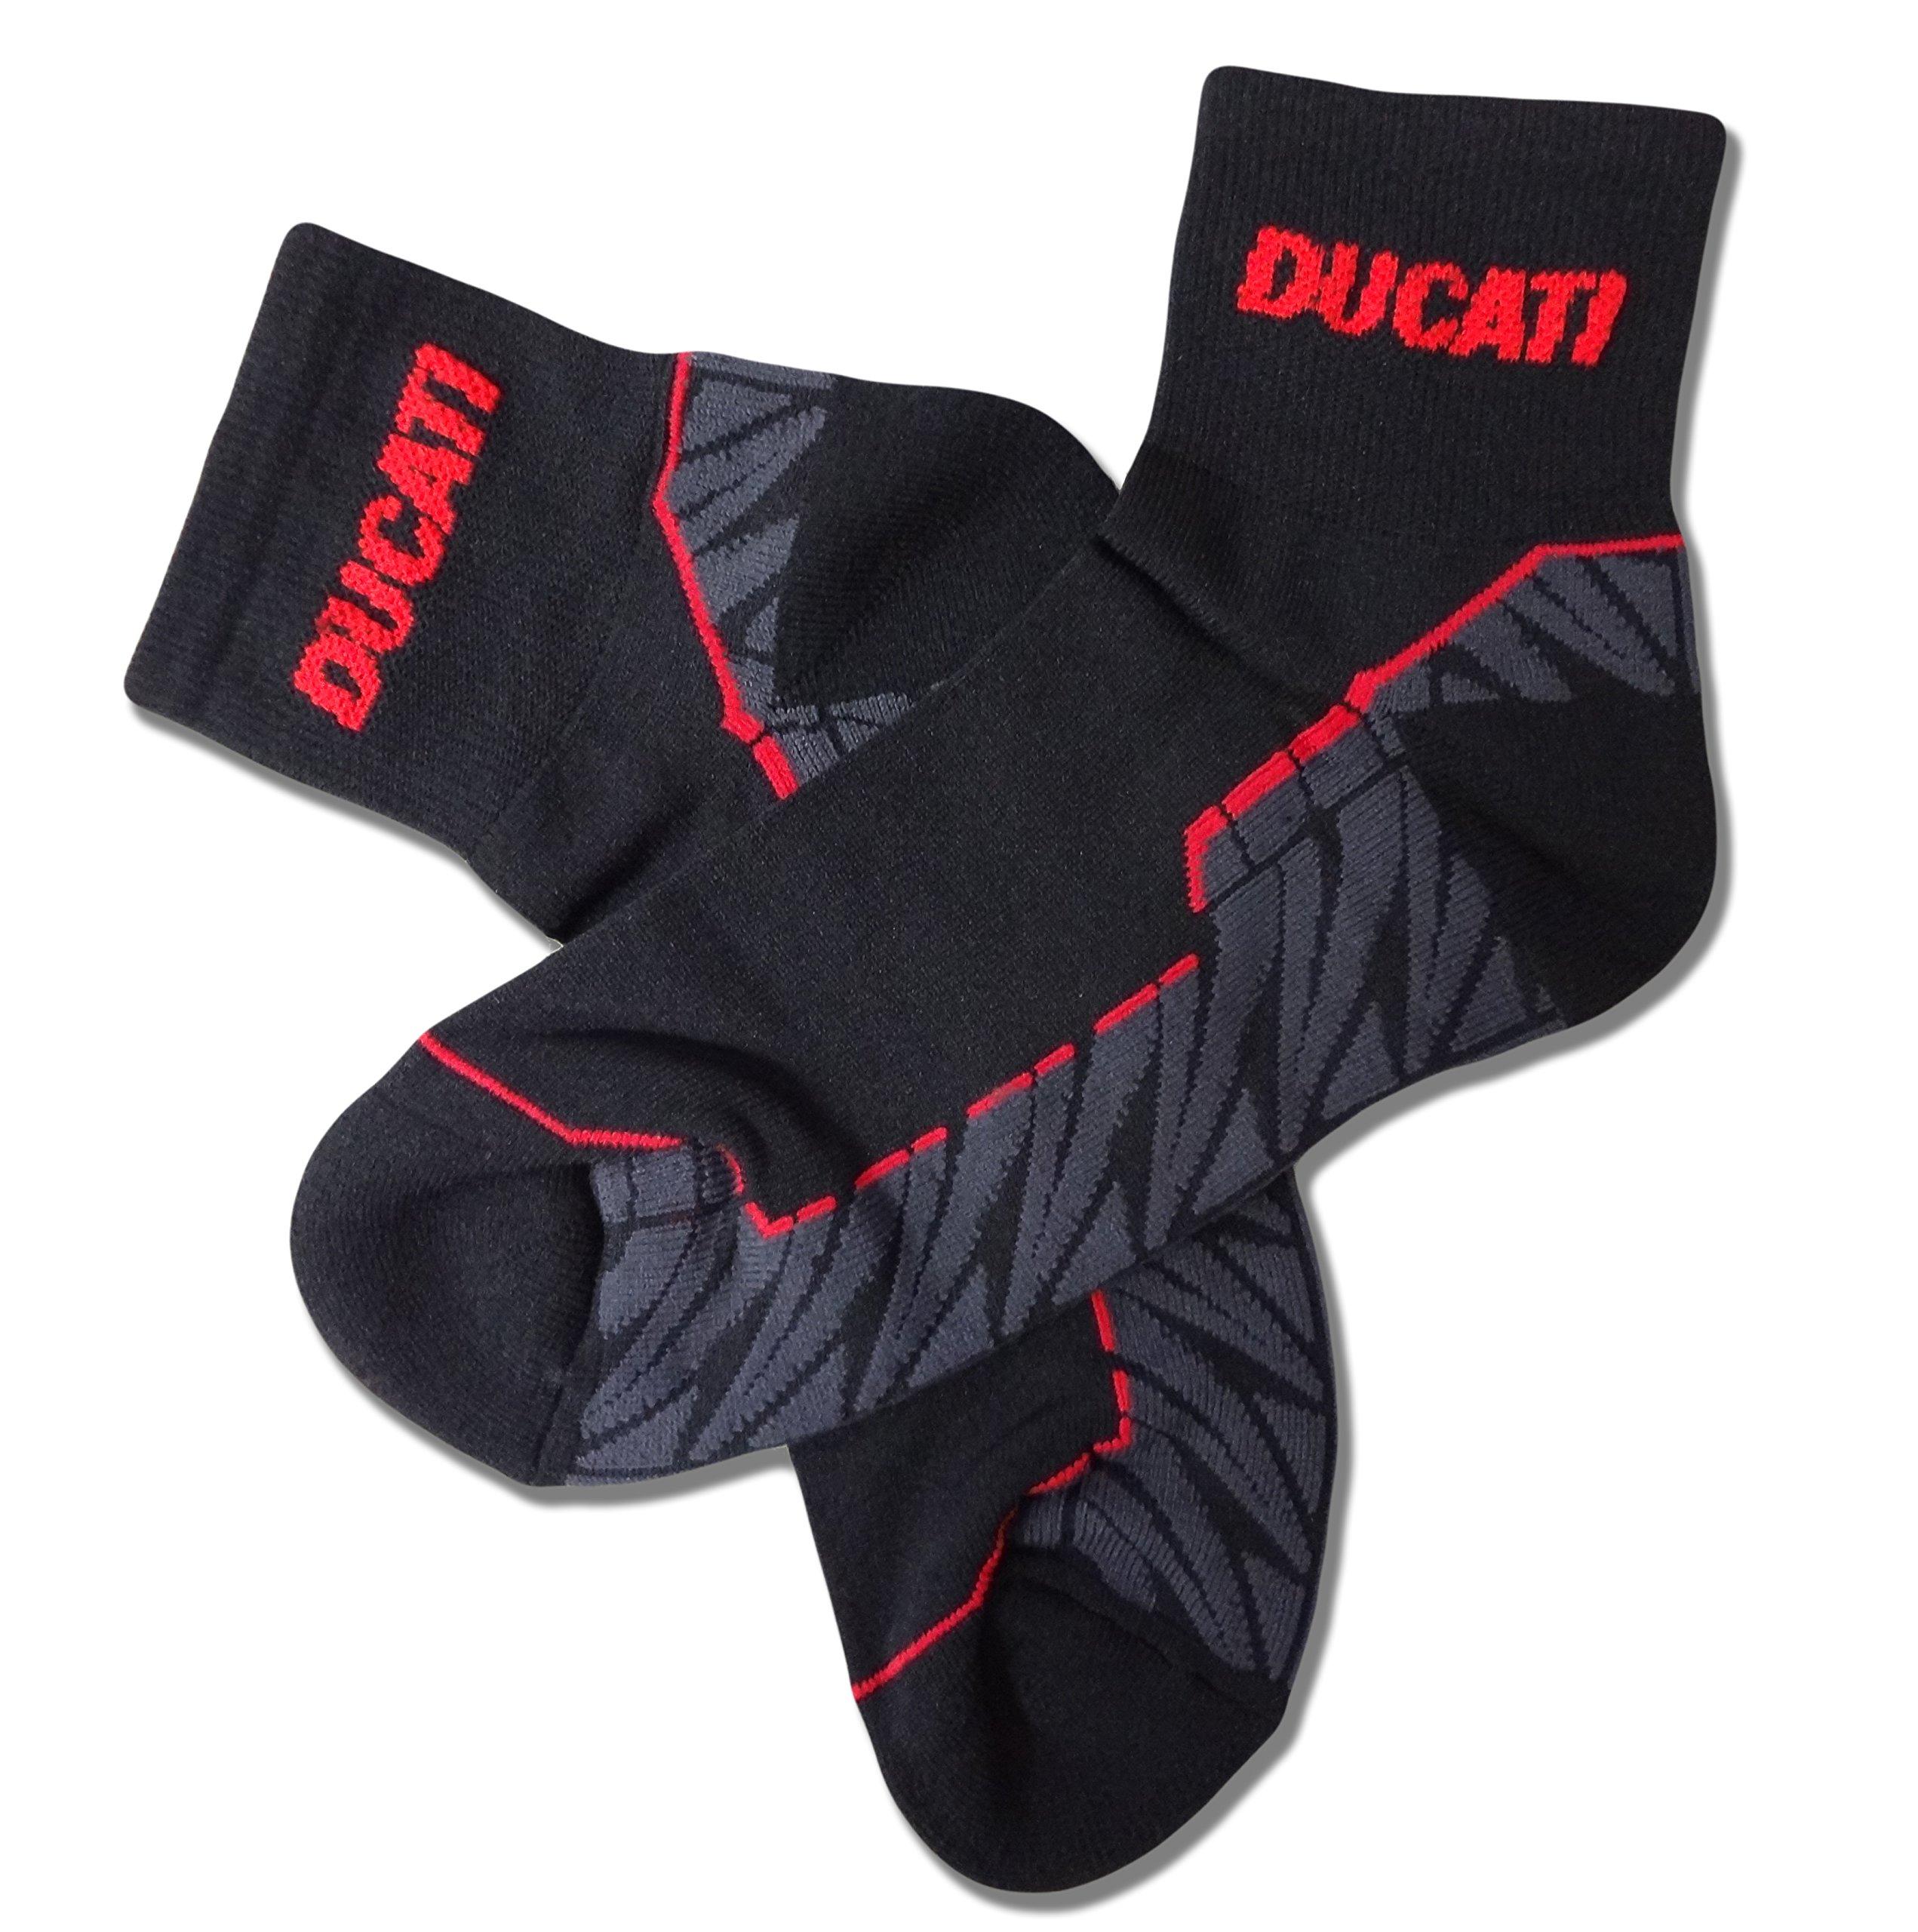 Ducati 981025003 Comfort Socks - Size 43-46